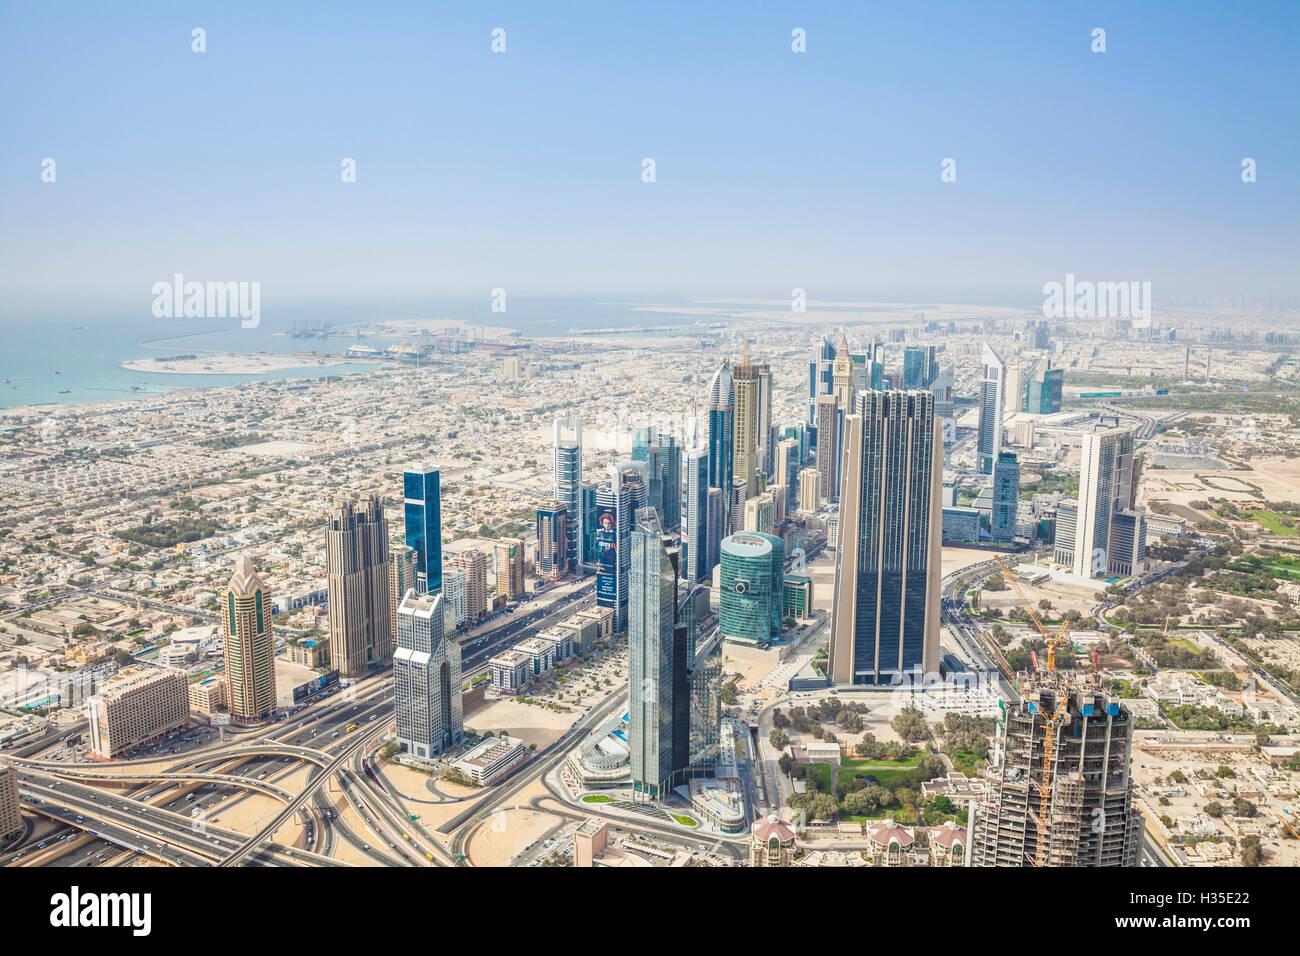 View of Sheikh Zayed Road and Dubai skyline, Dubai City, United Arab Emirates, Middle East - Stock Image